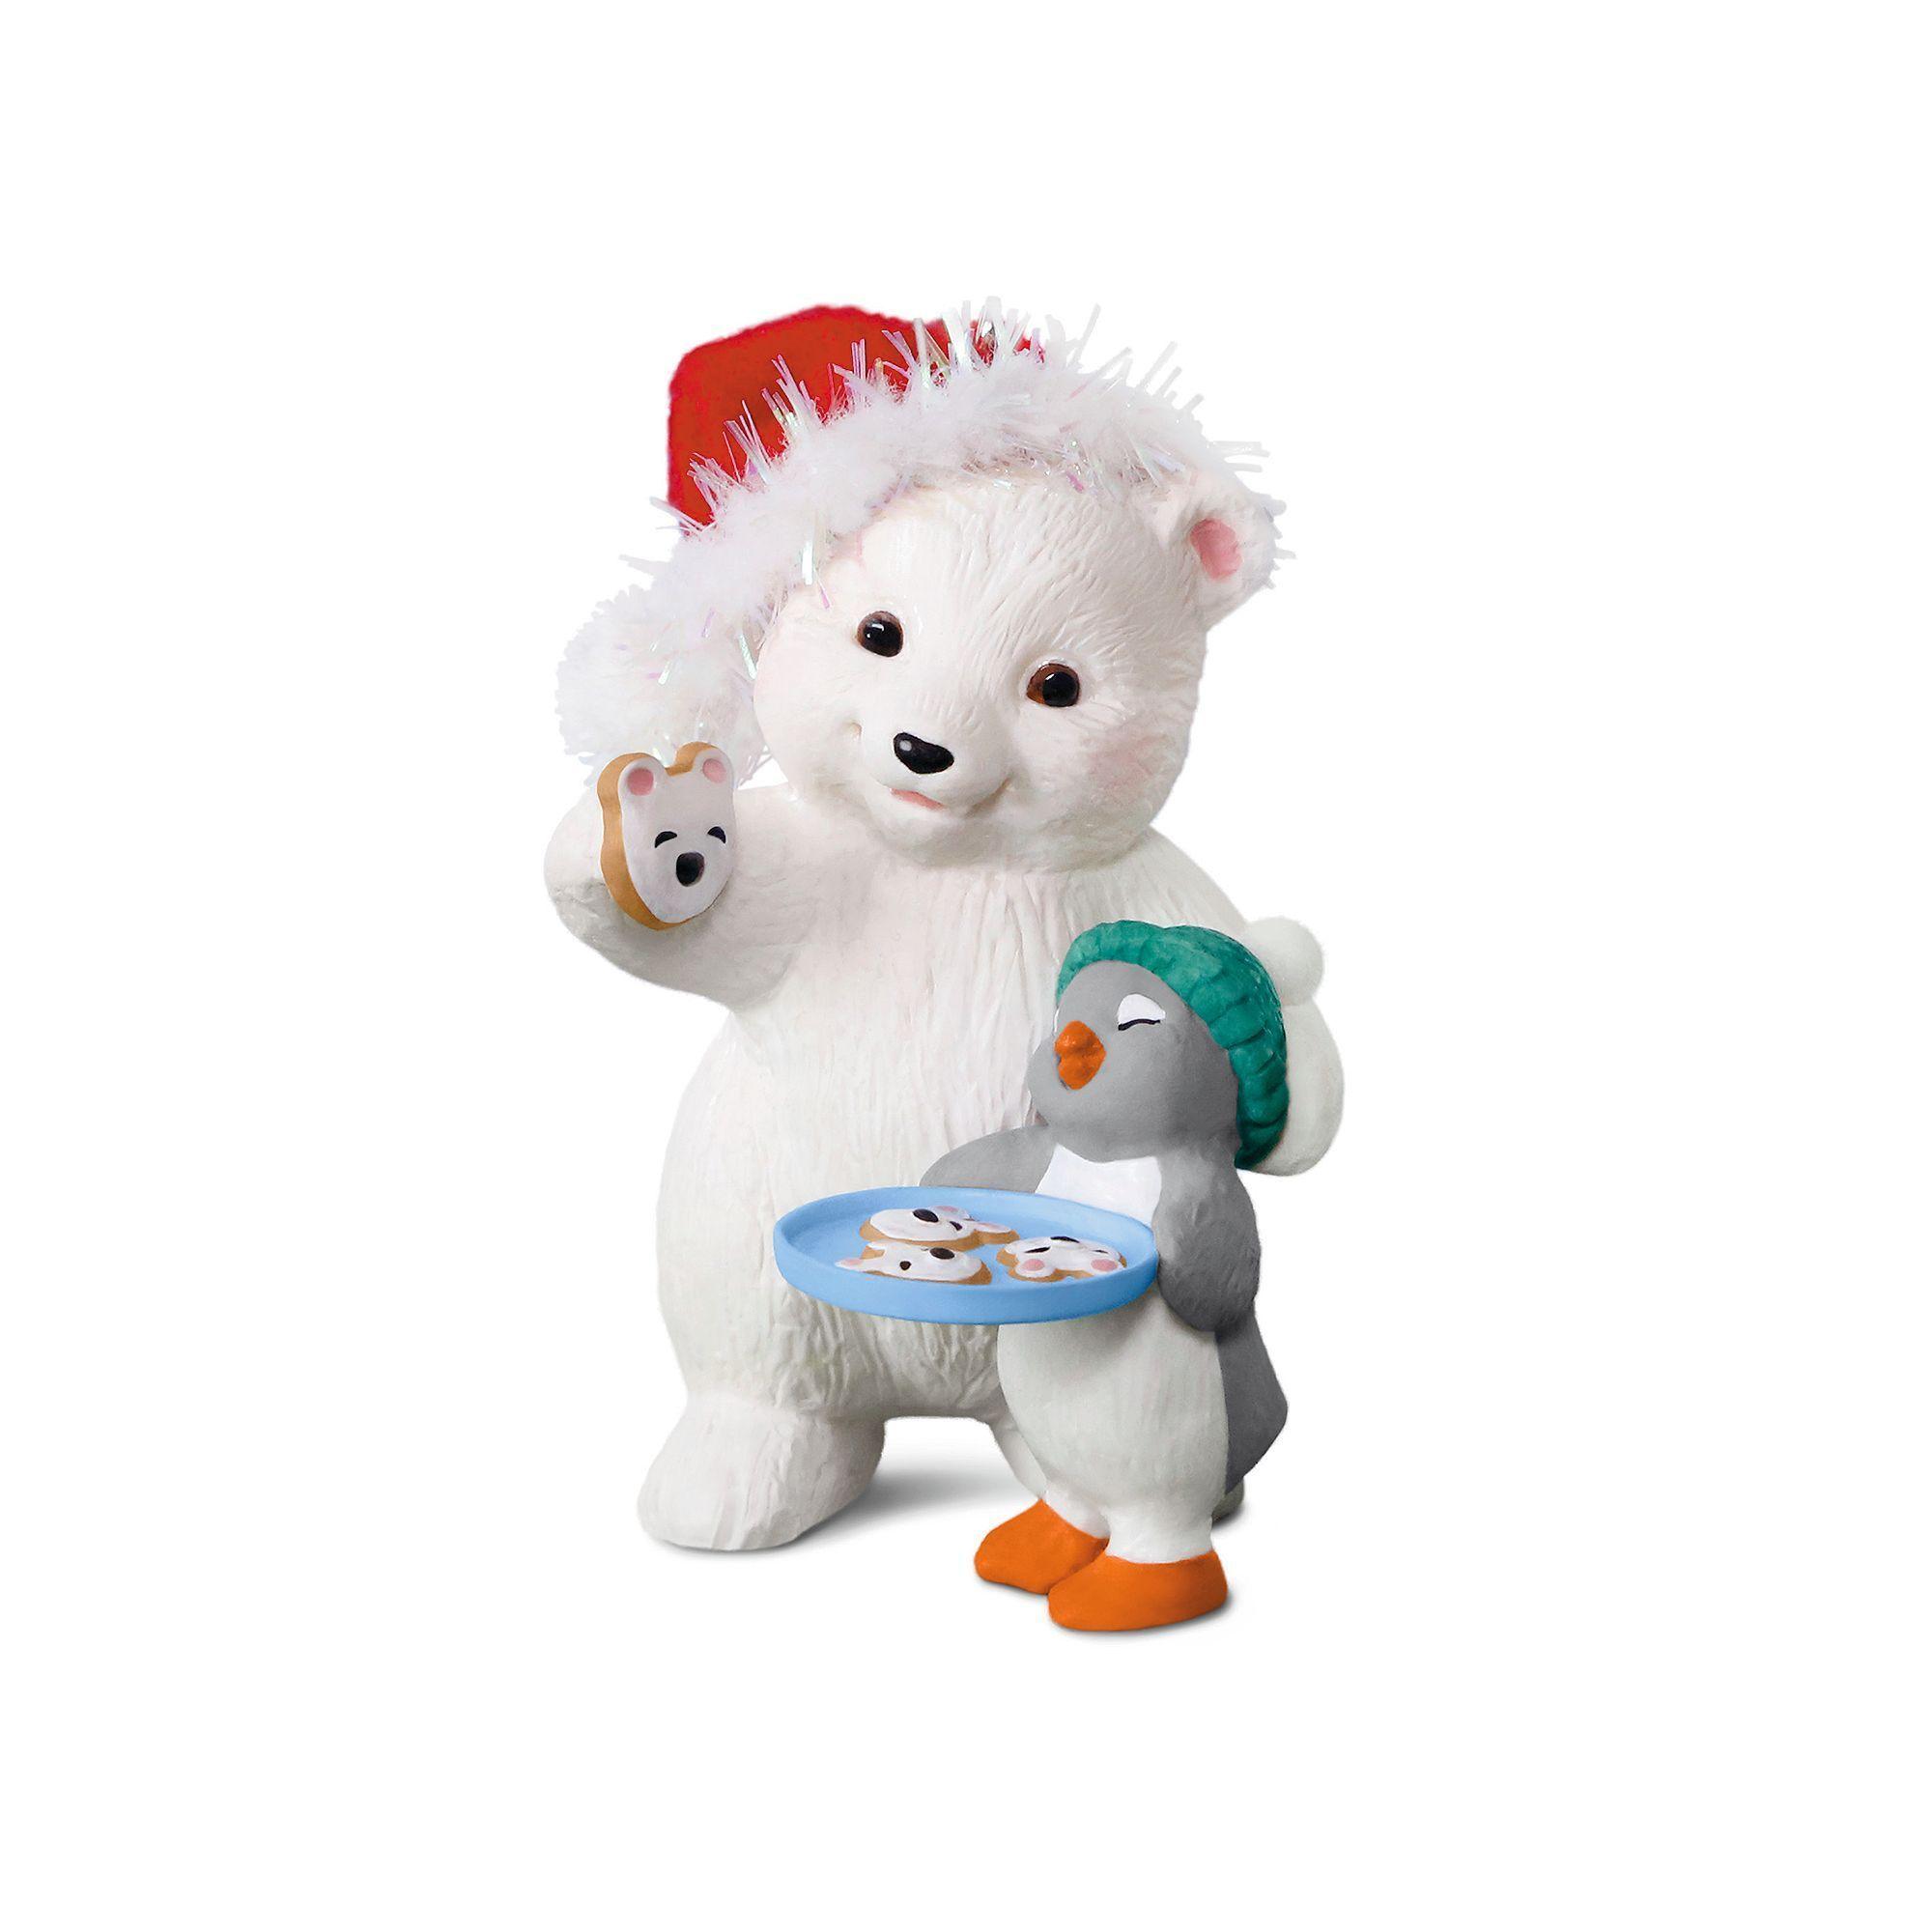 Hallmark 2017 Miniature Keepsake Ornament Sweet Li/'l Santa Santa on Gumdrop